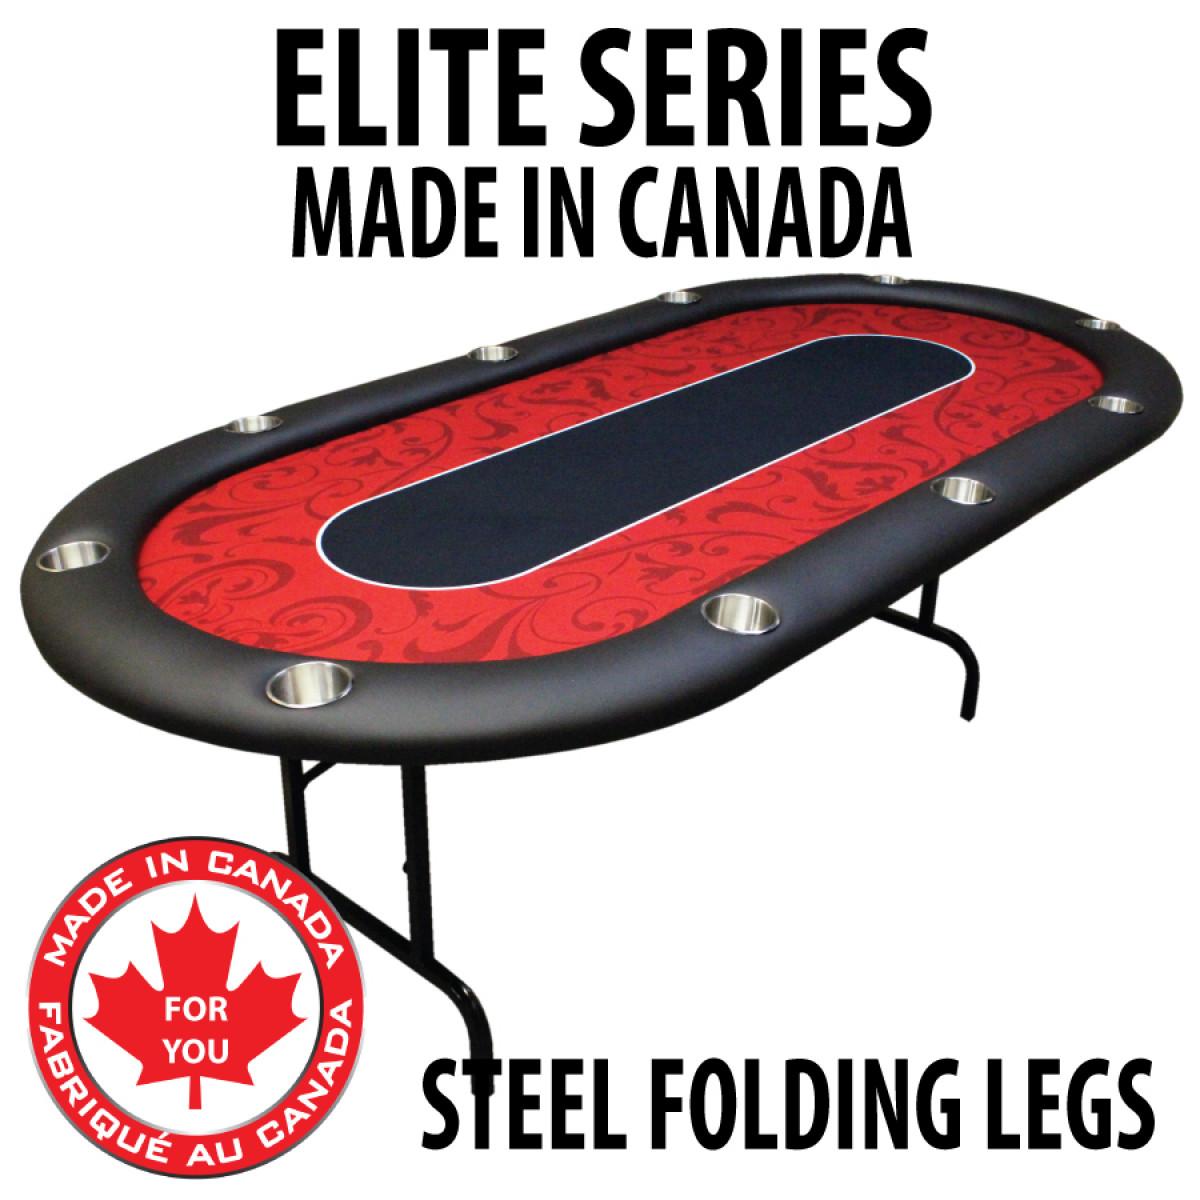 POKER TABLE SPS ELITE Red Full Bumper Table With Steel Folding Legs